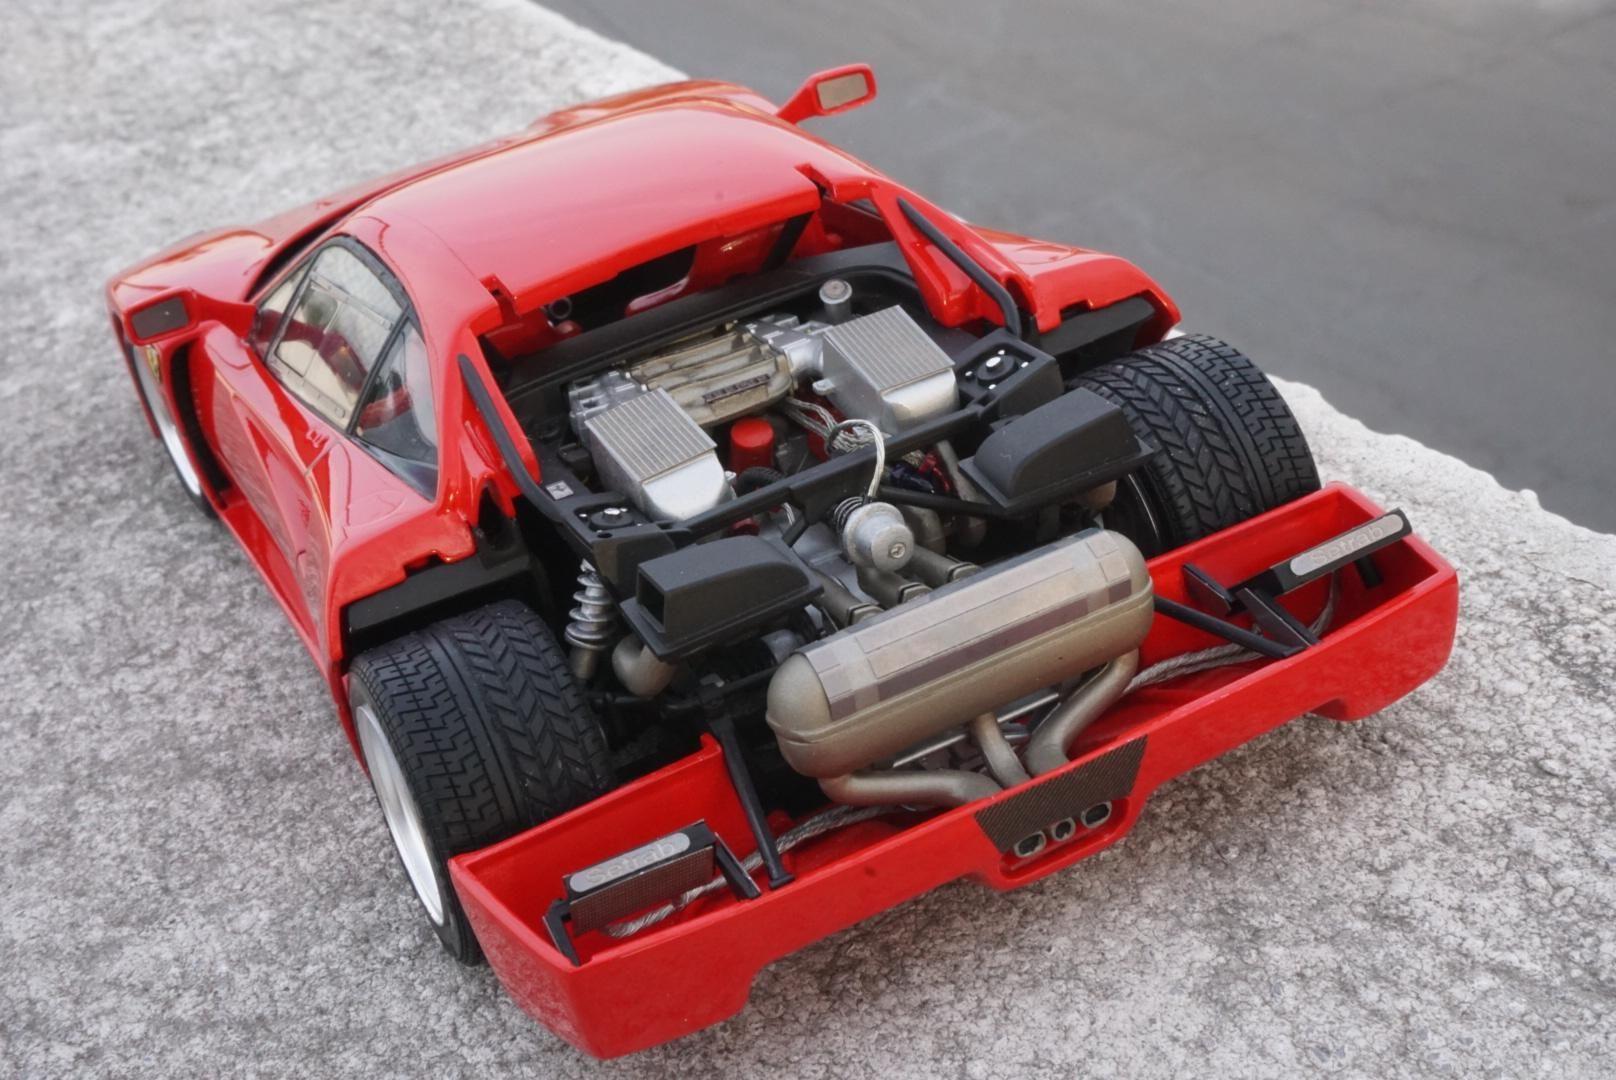 Ferrari F40 Tamiya 1 24 Ferrari F40 Ferrari Scale Models Cars